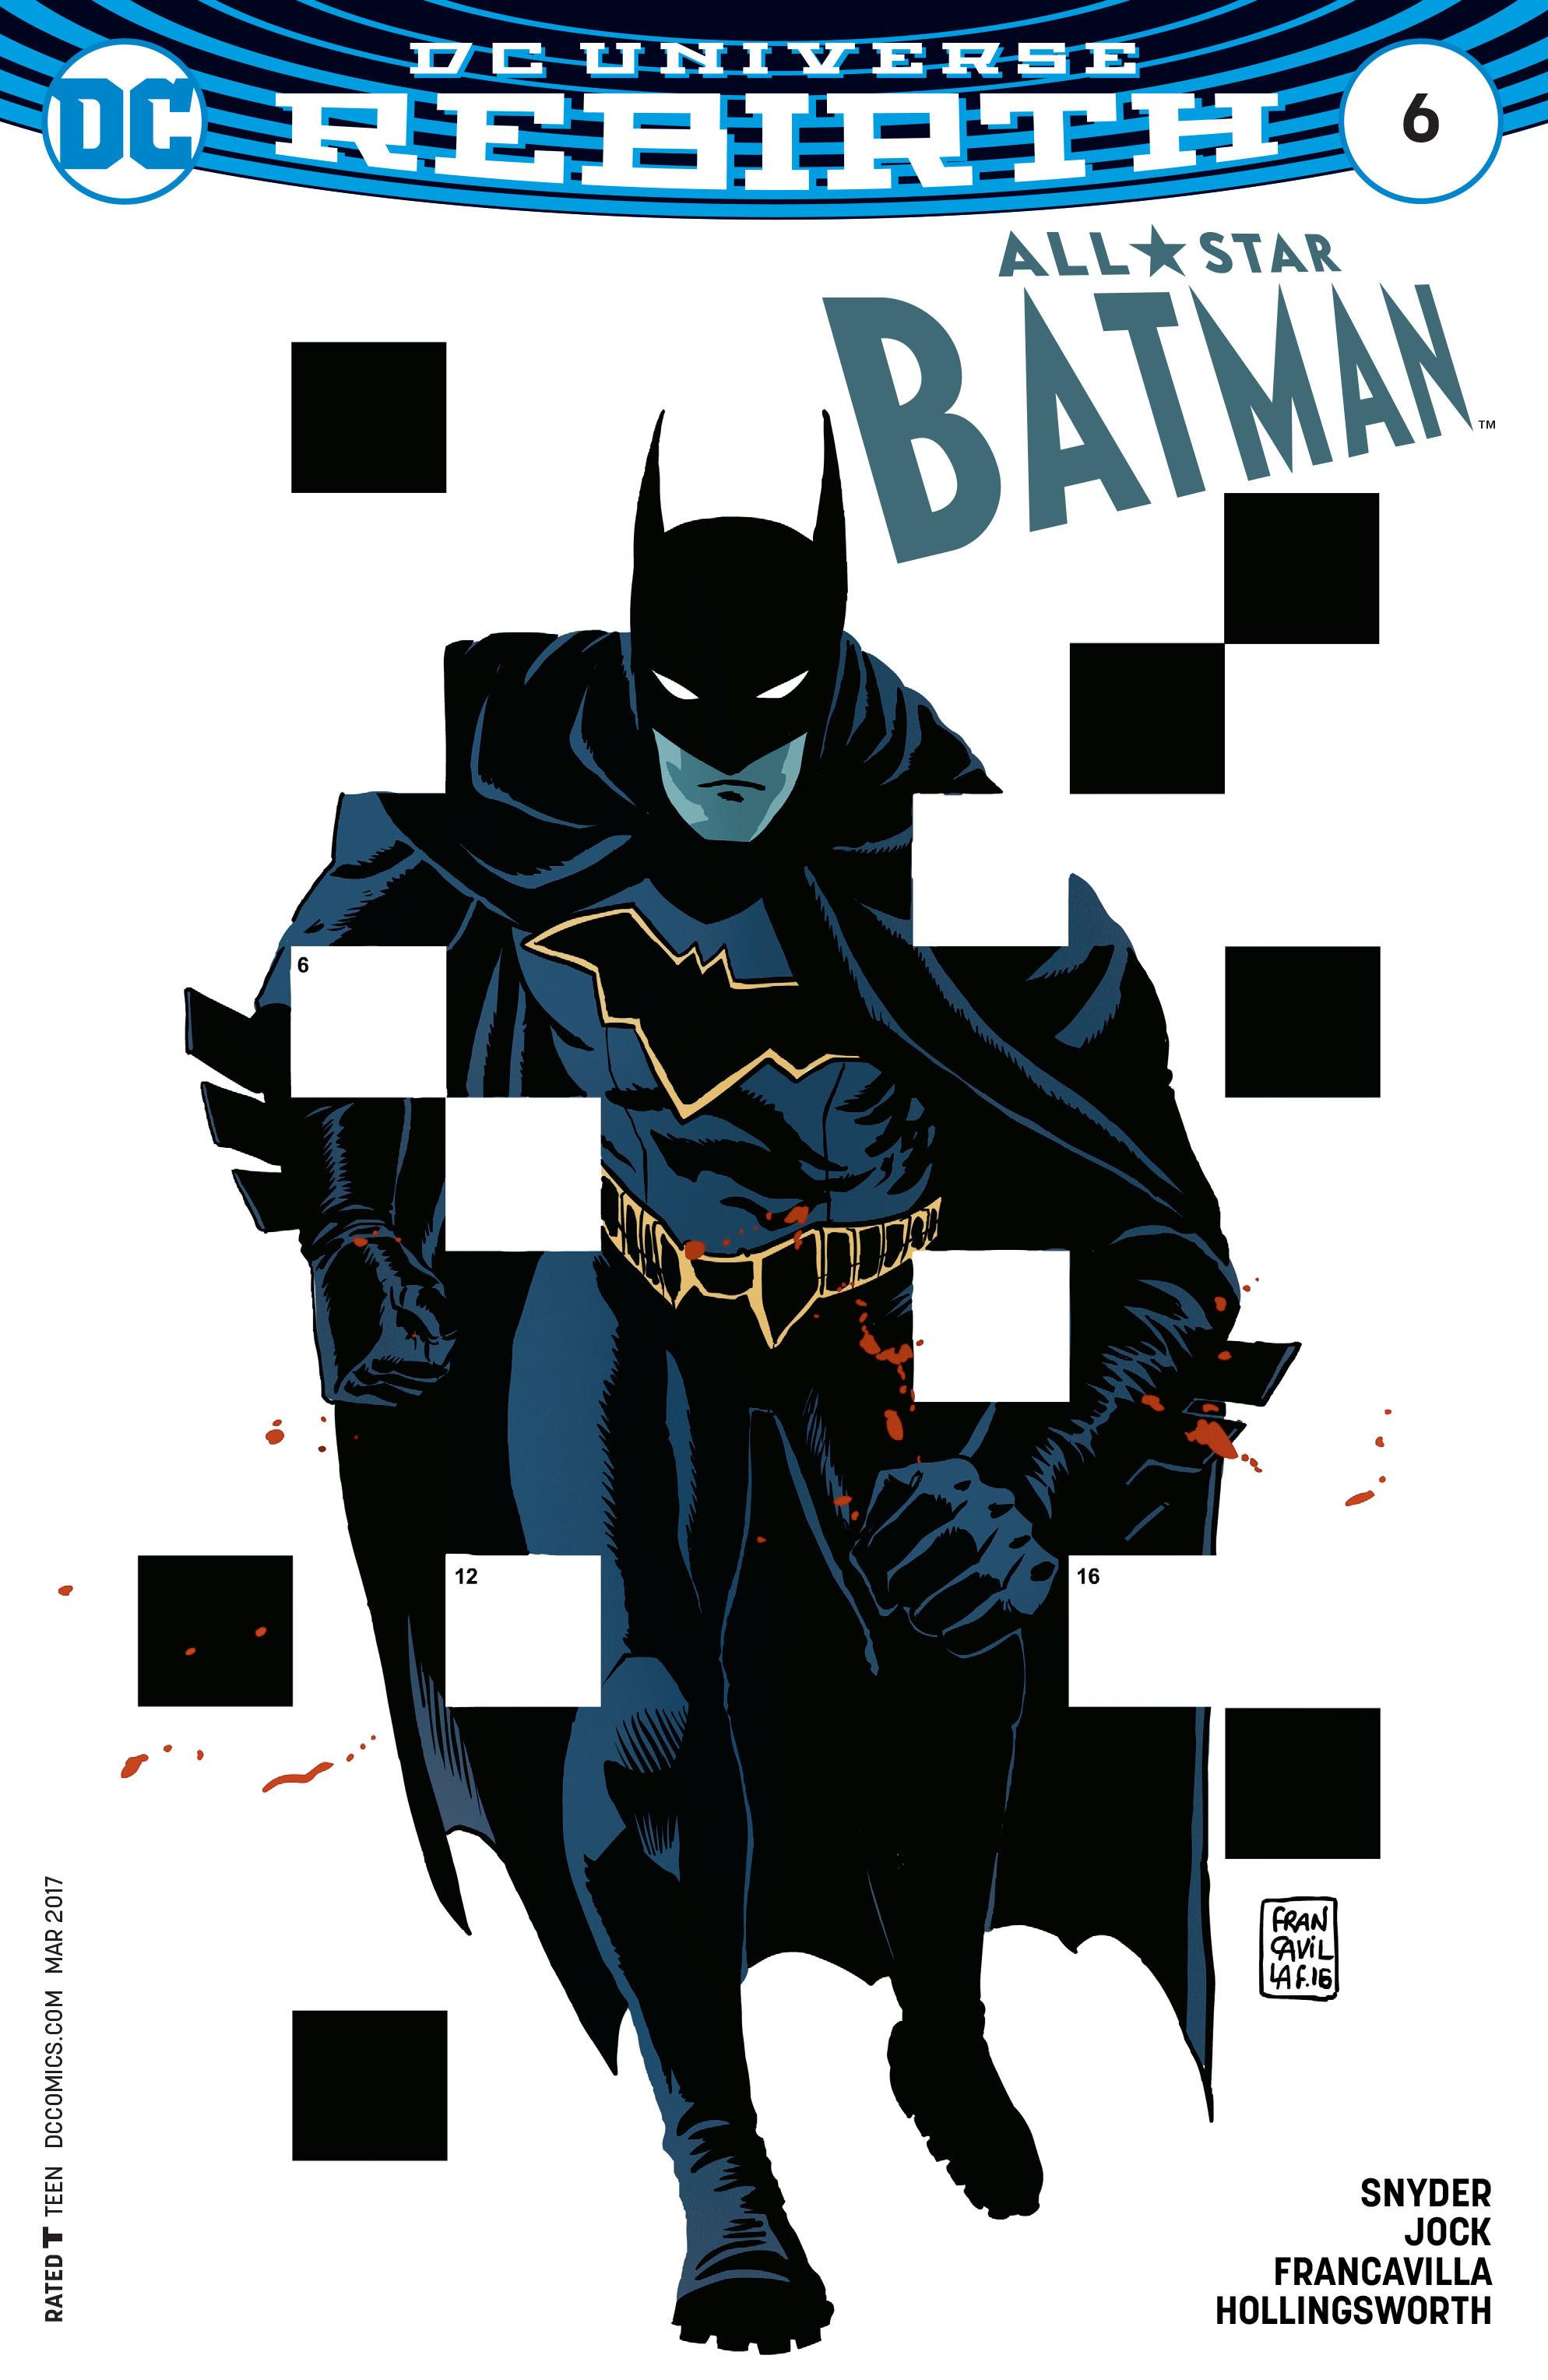 Read online All-Star Batman comic -  Issue #6 - 3